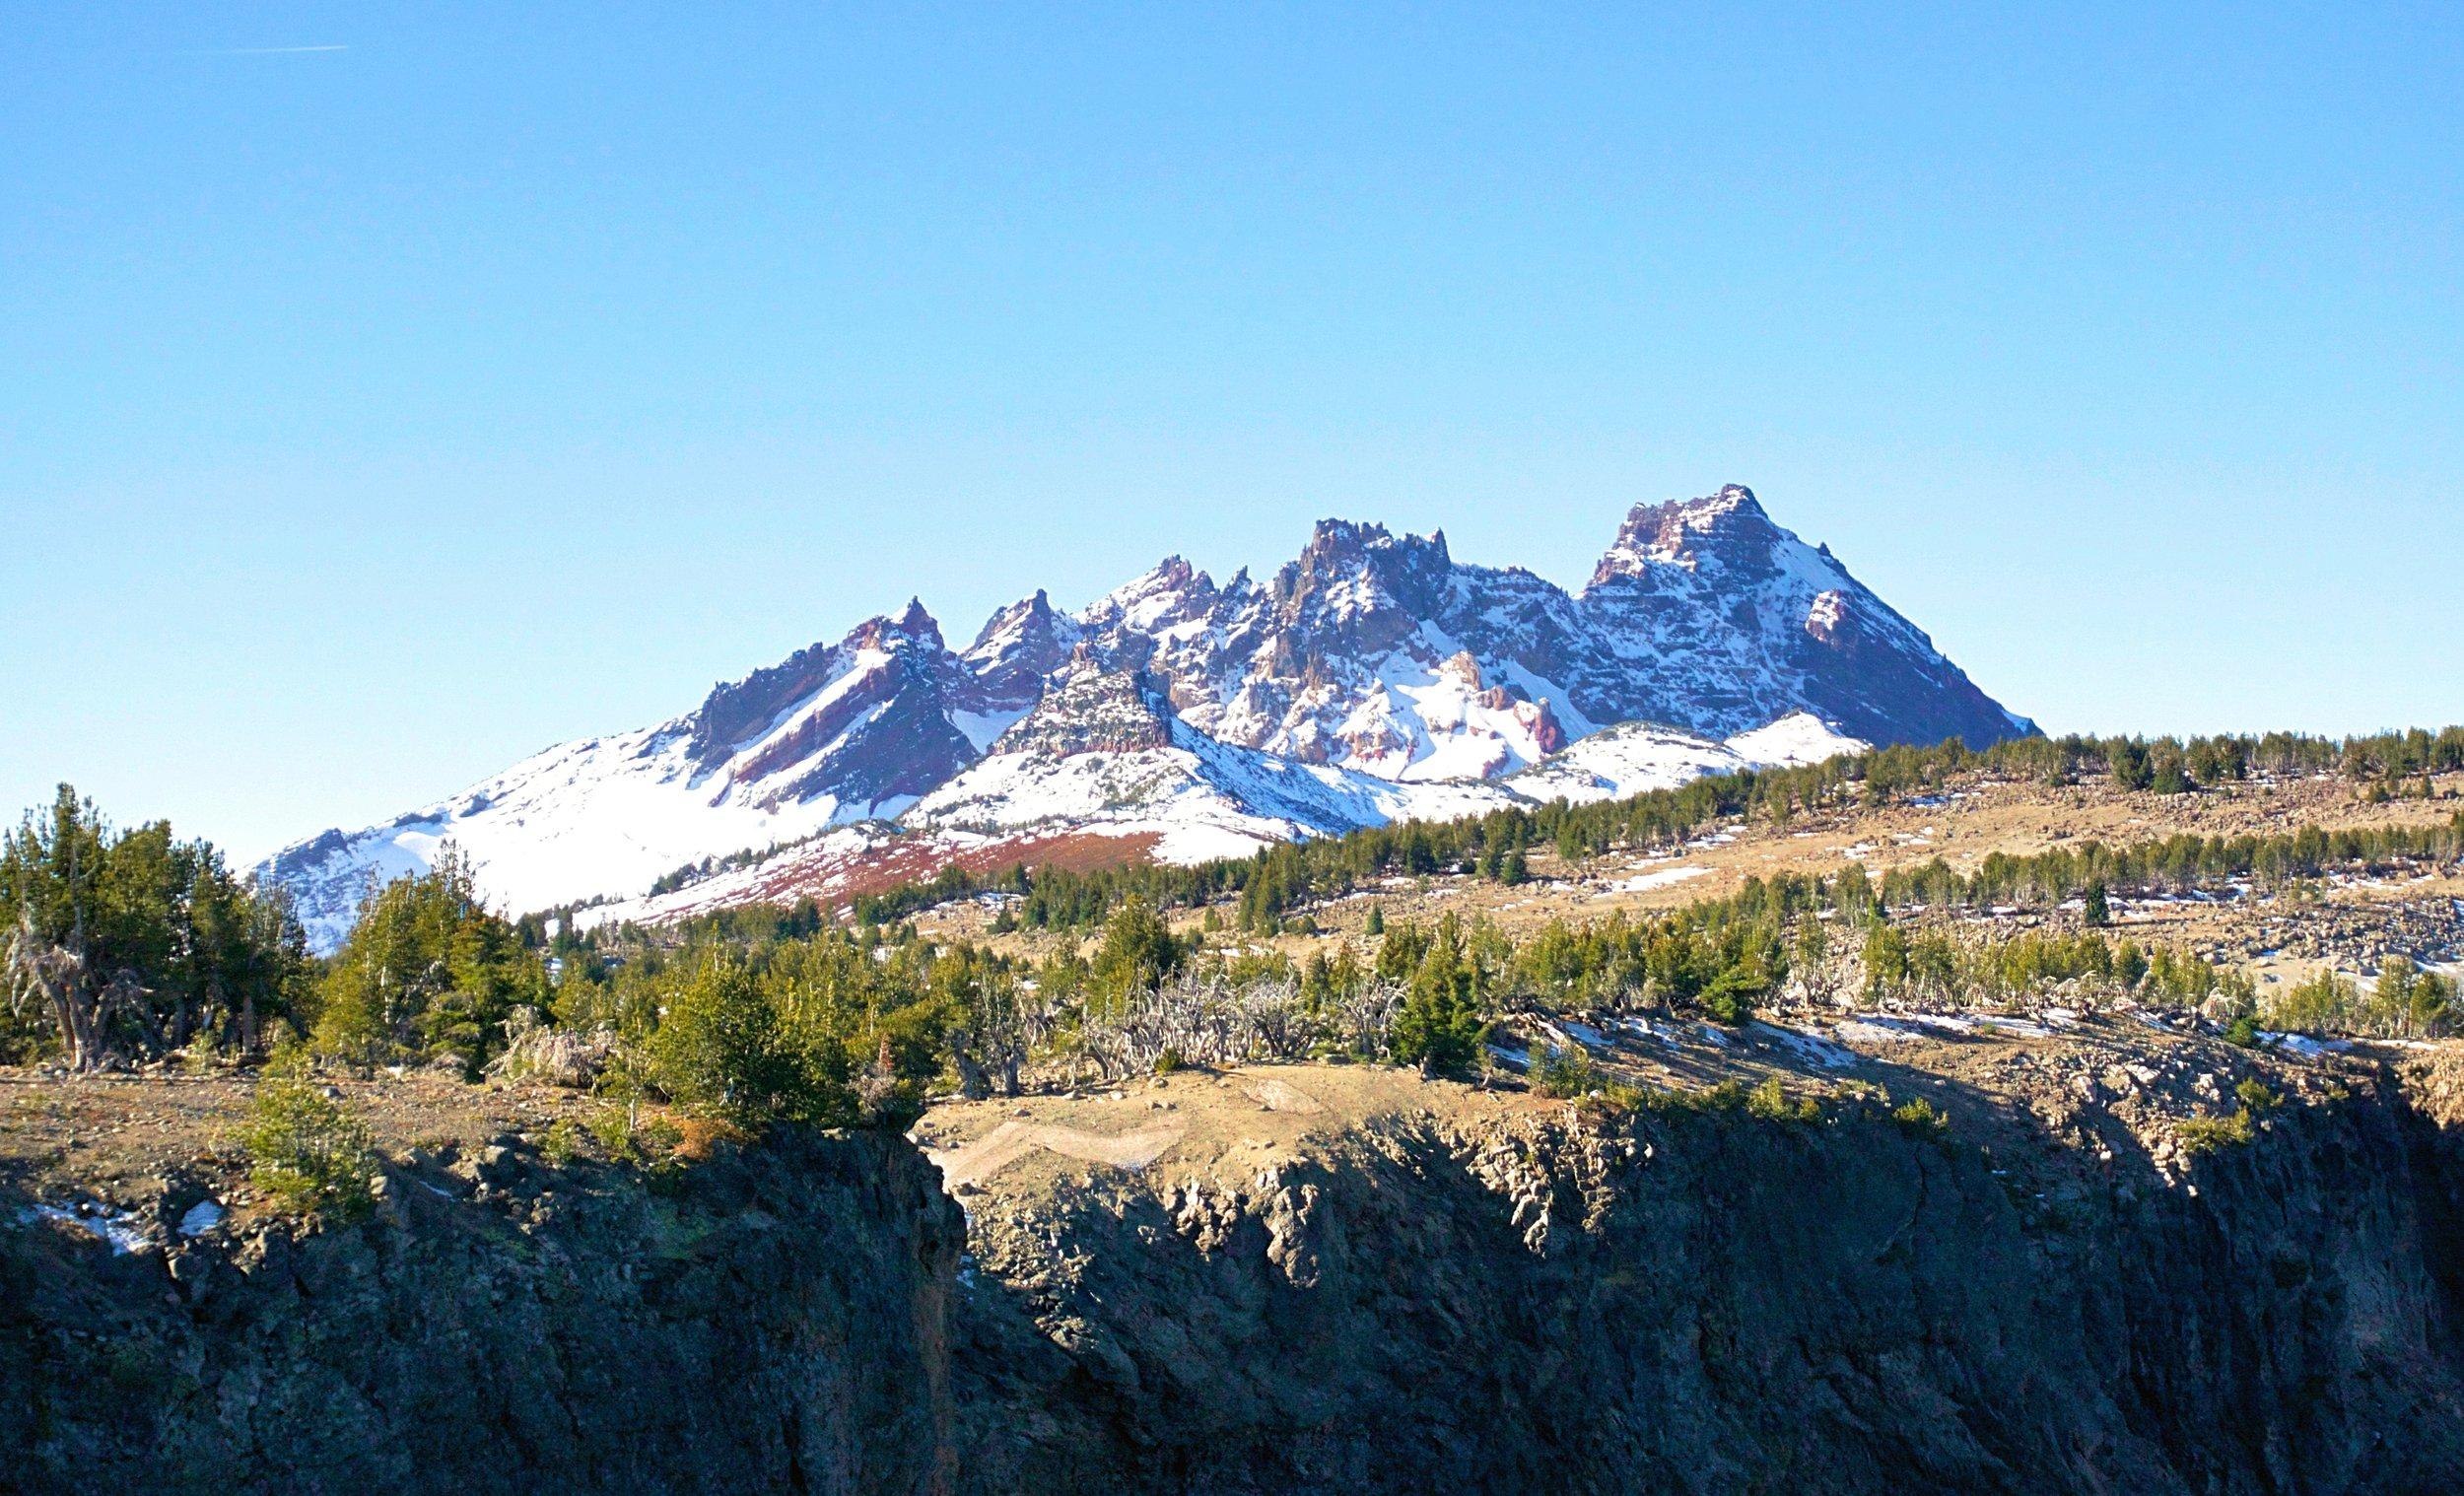 Tam+McArthur+Trail,+Bend+Oregon.jpeg